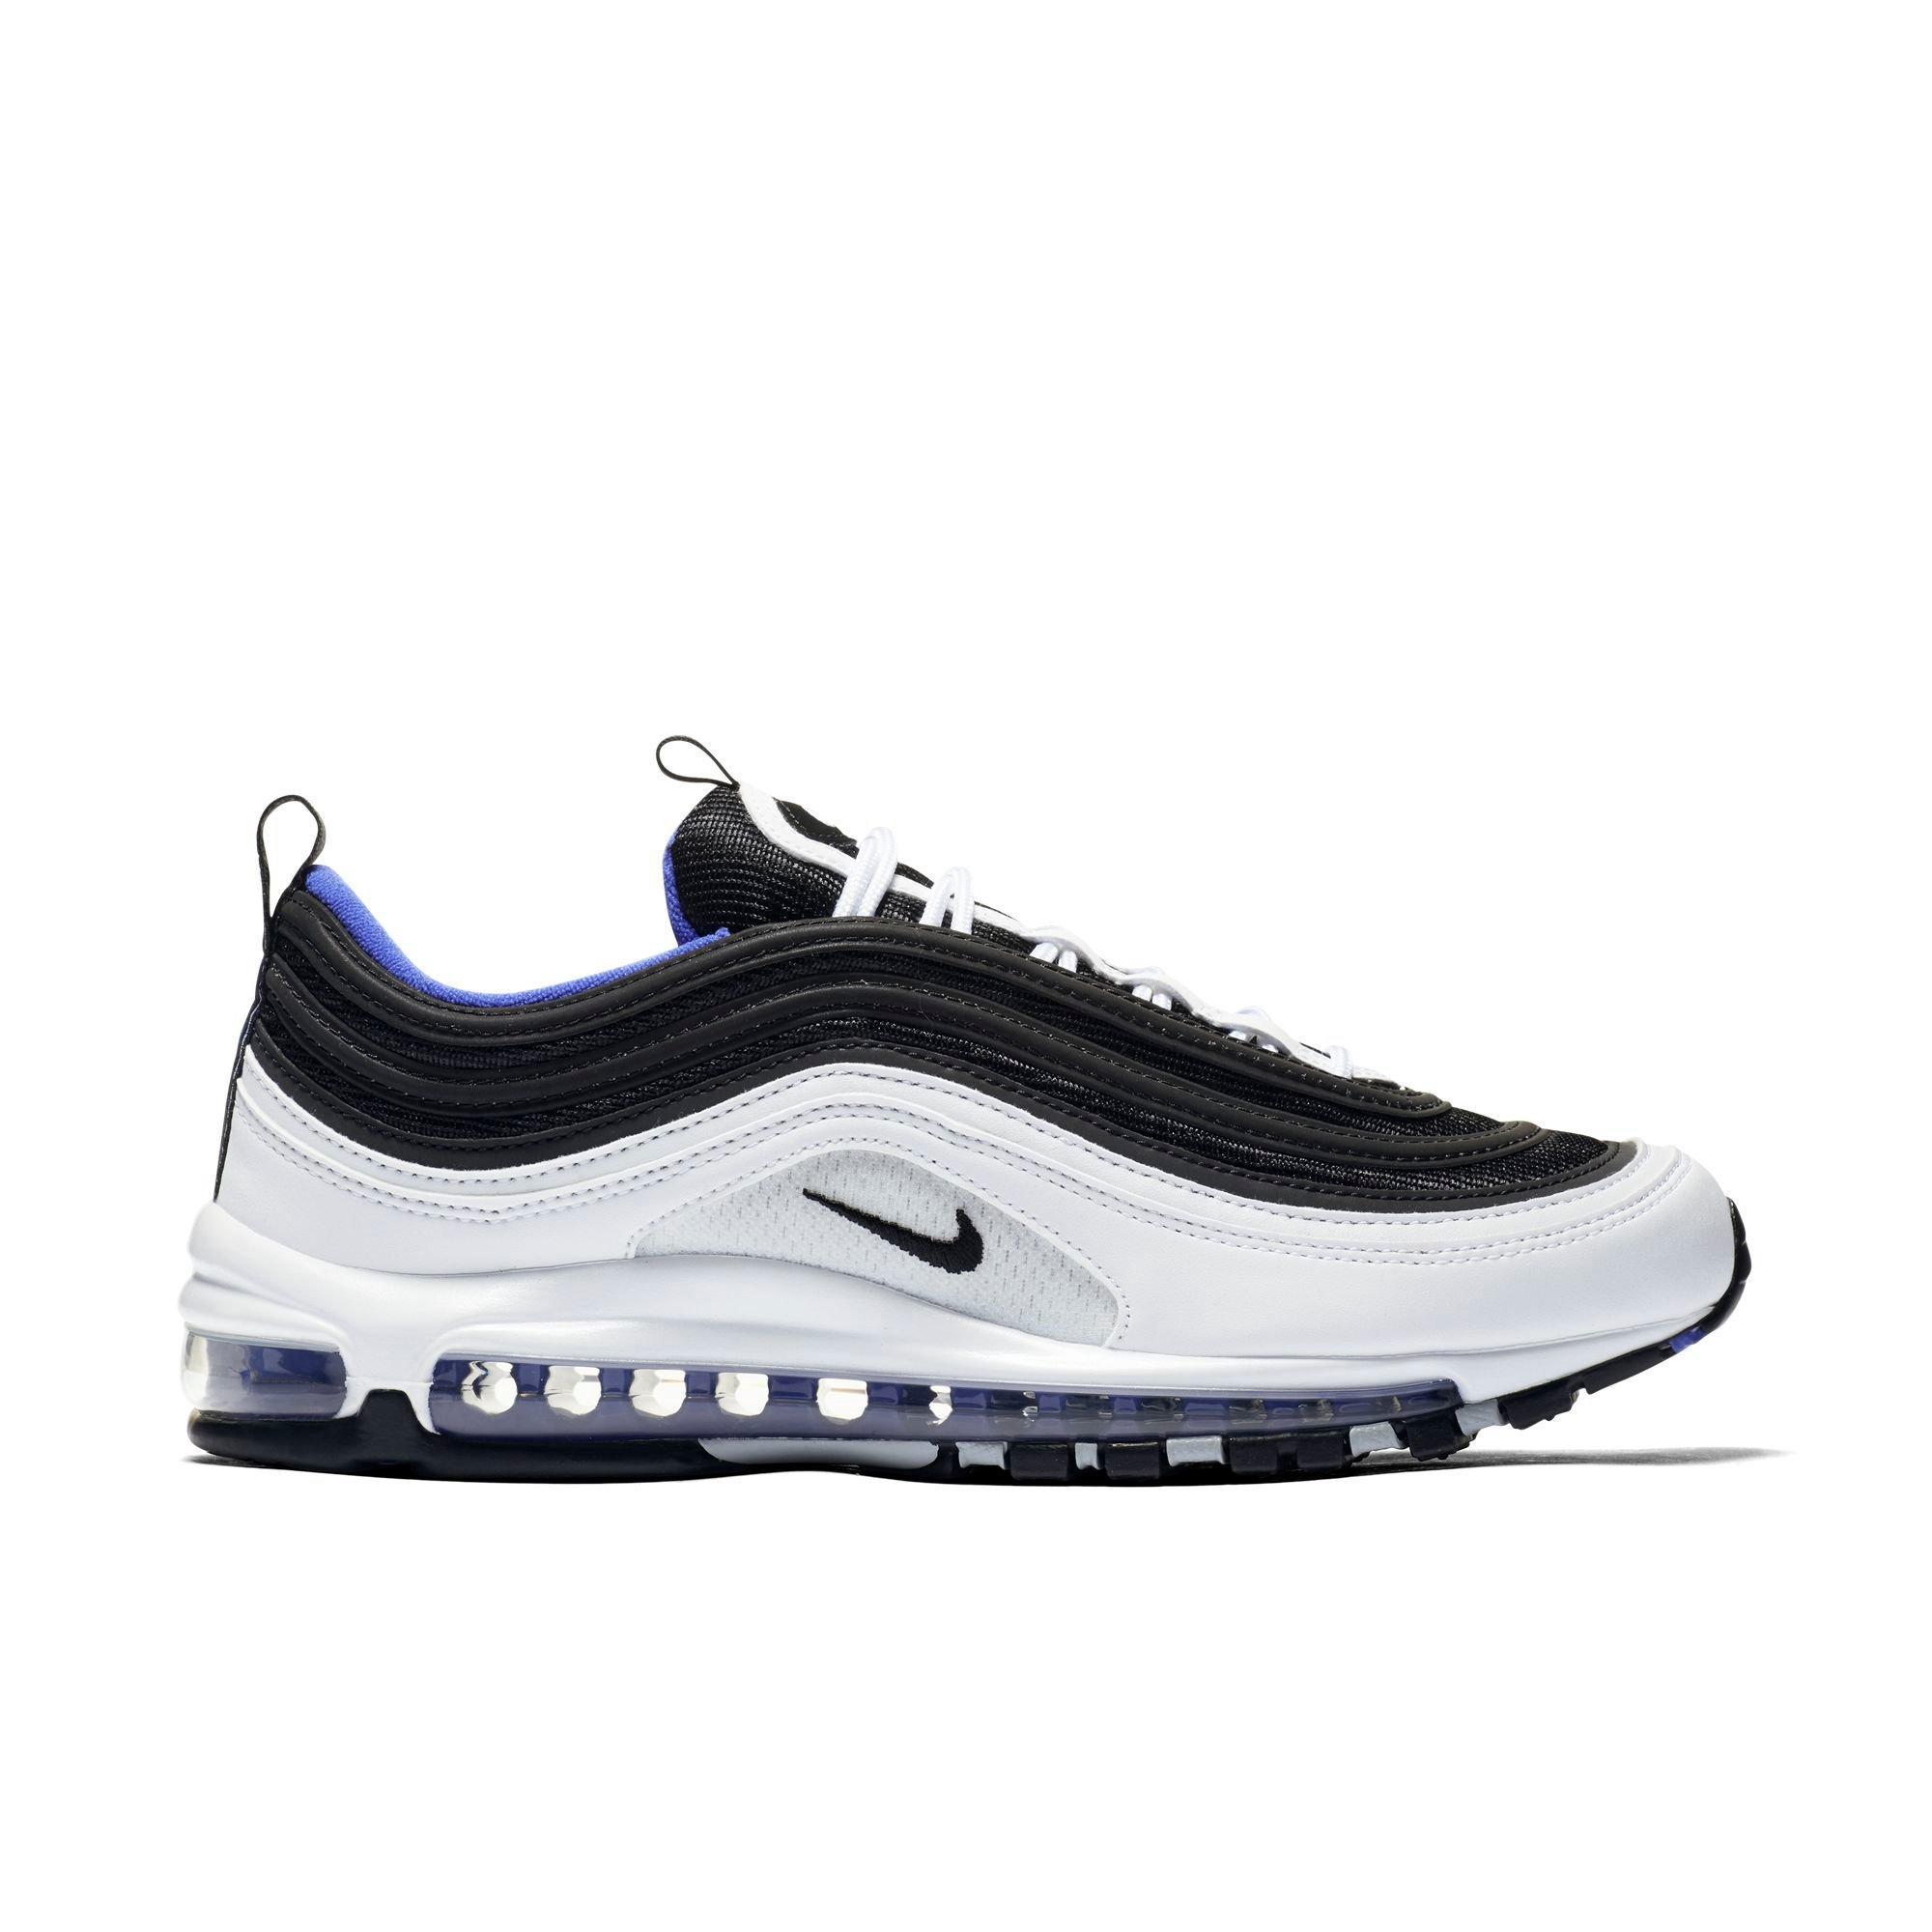 b39df309f1d Nike Shox Sale Size 13 Nike Shox Cheap